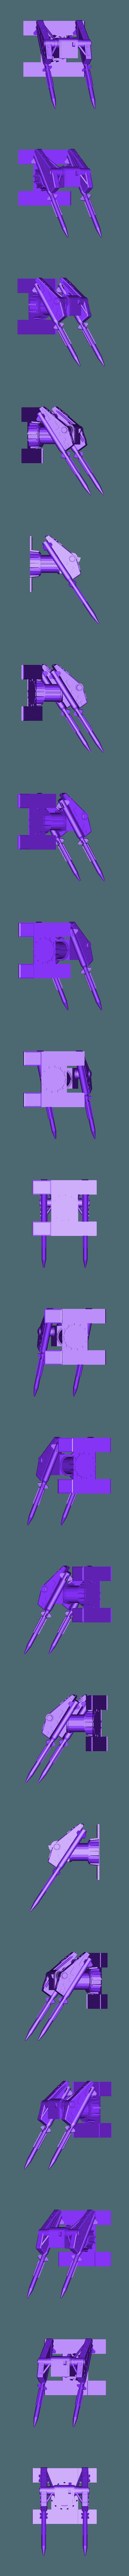 mk10_launcher_1_72.stl Download free STL file Terrier RIM-2 Missiles launcher mk10 • 3D printing template, TomasLA